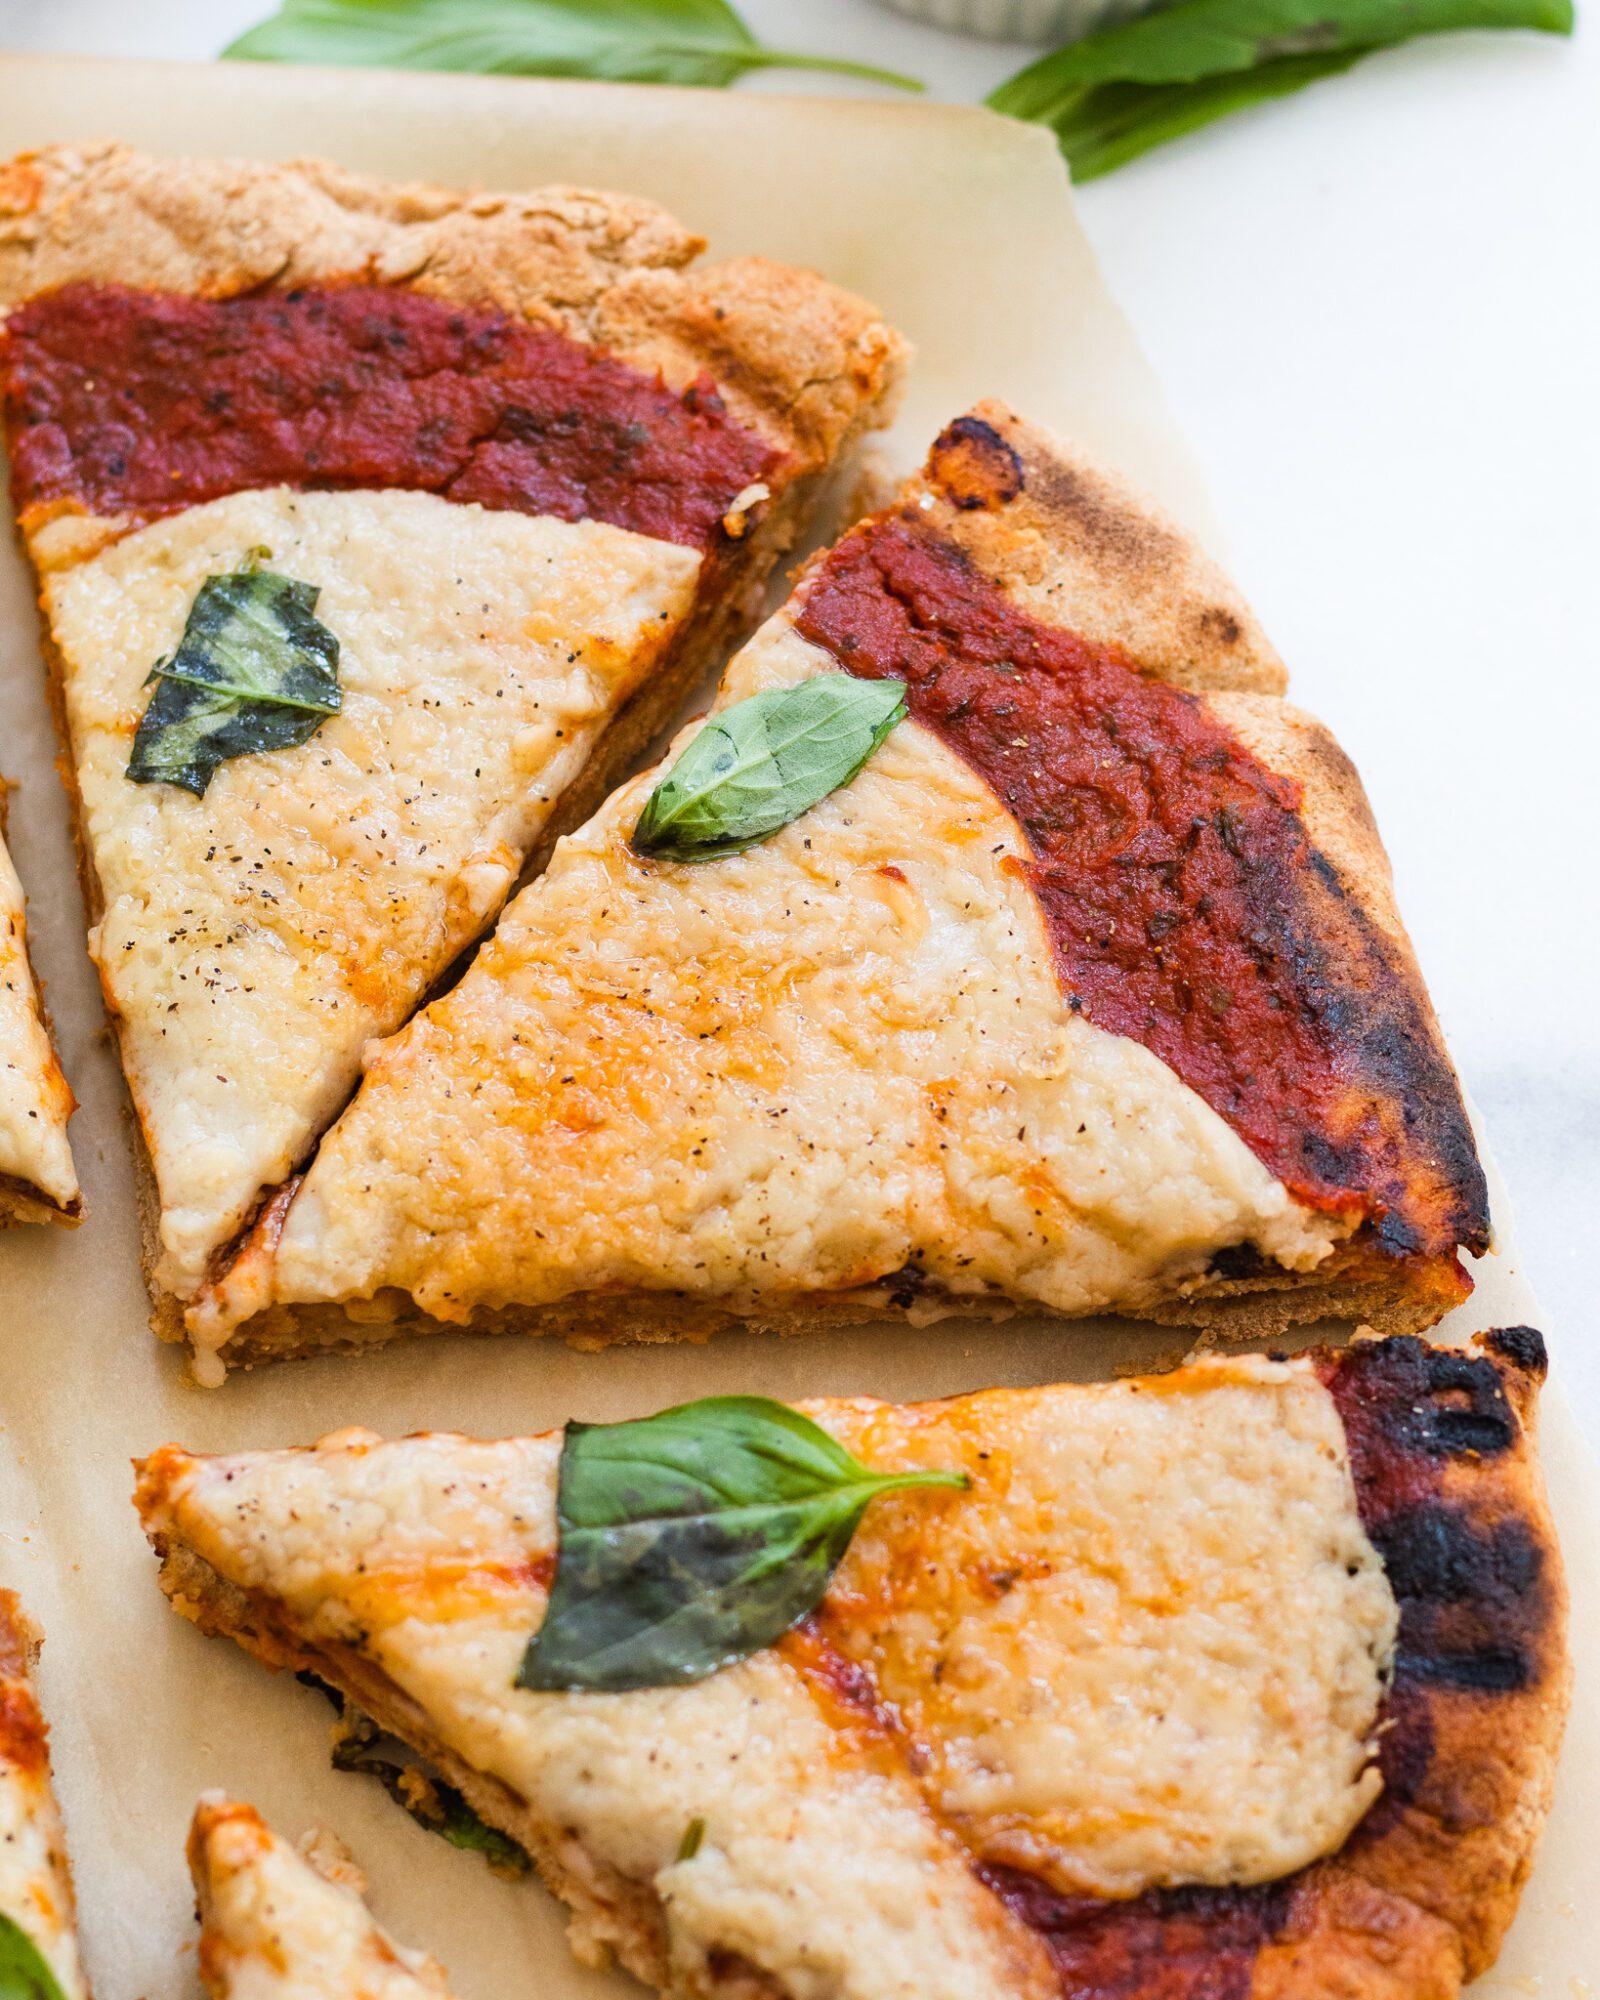 slices of vegan pizza